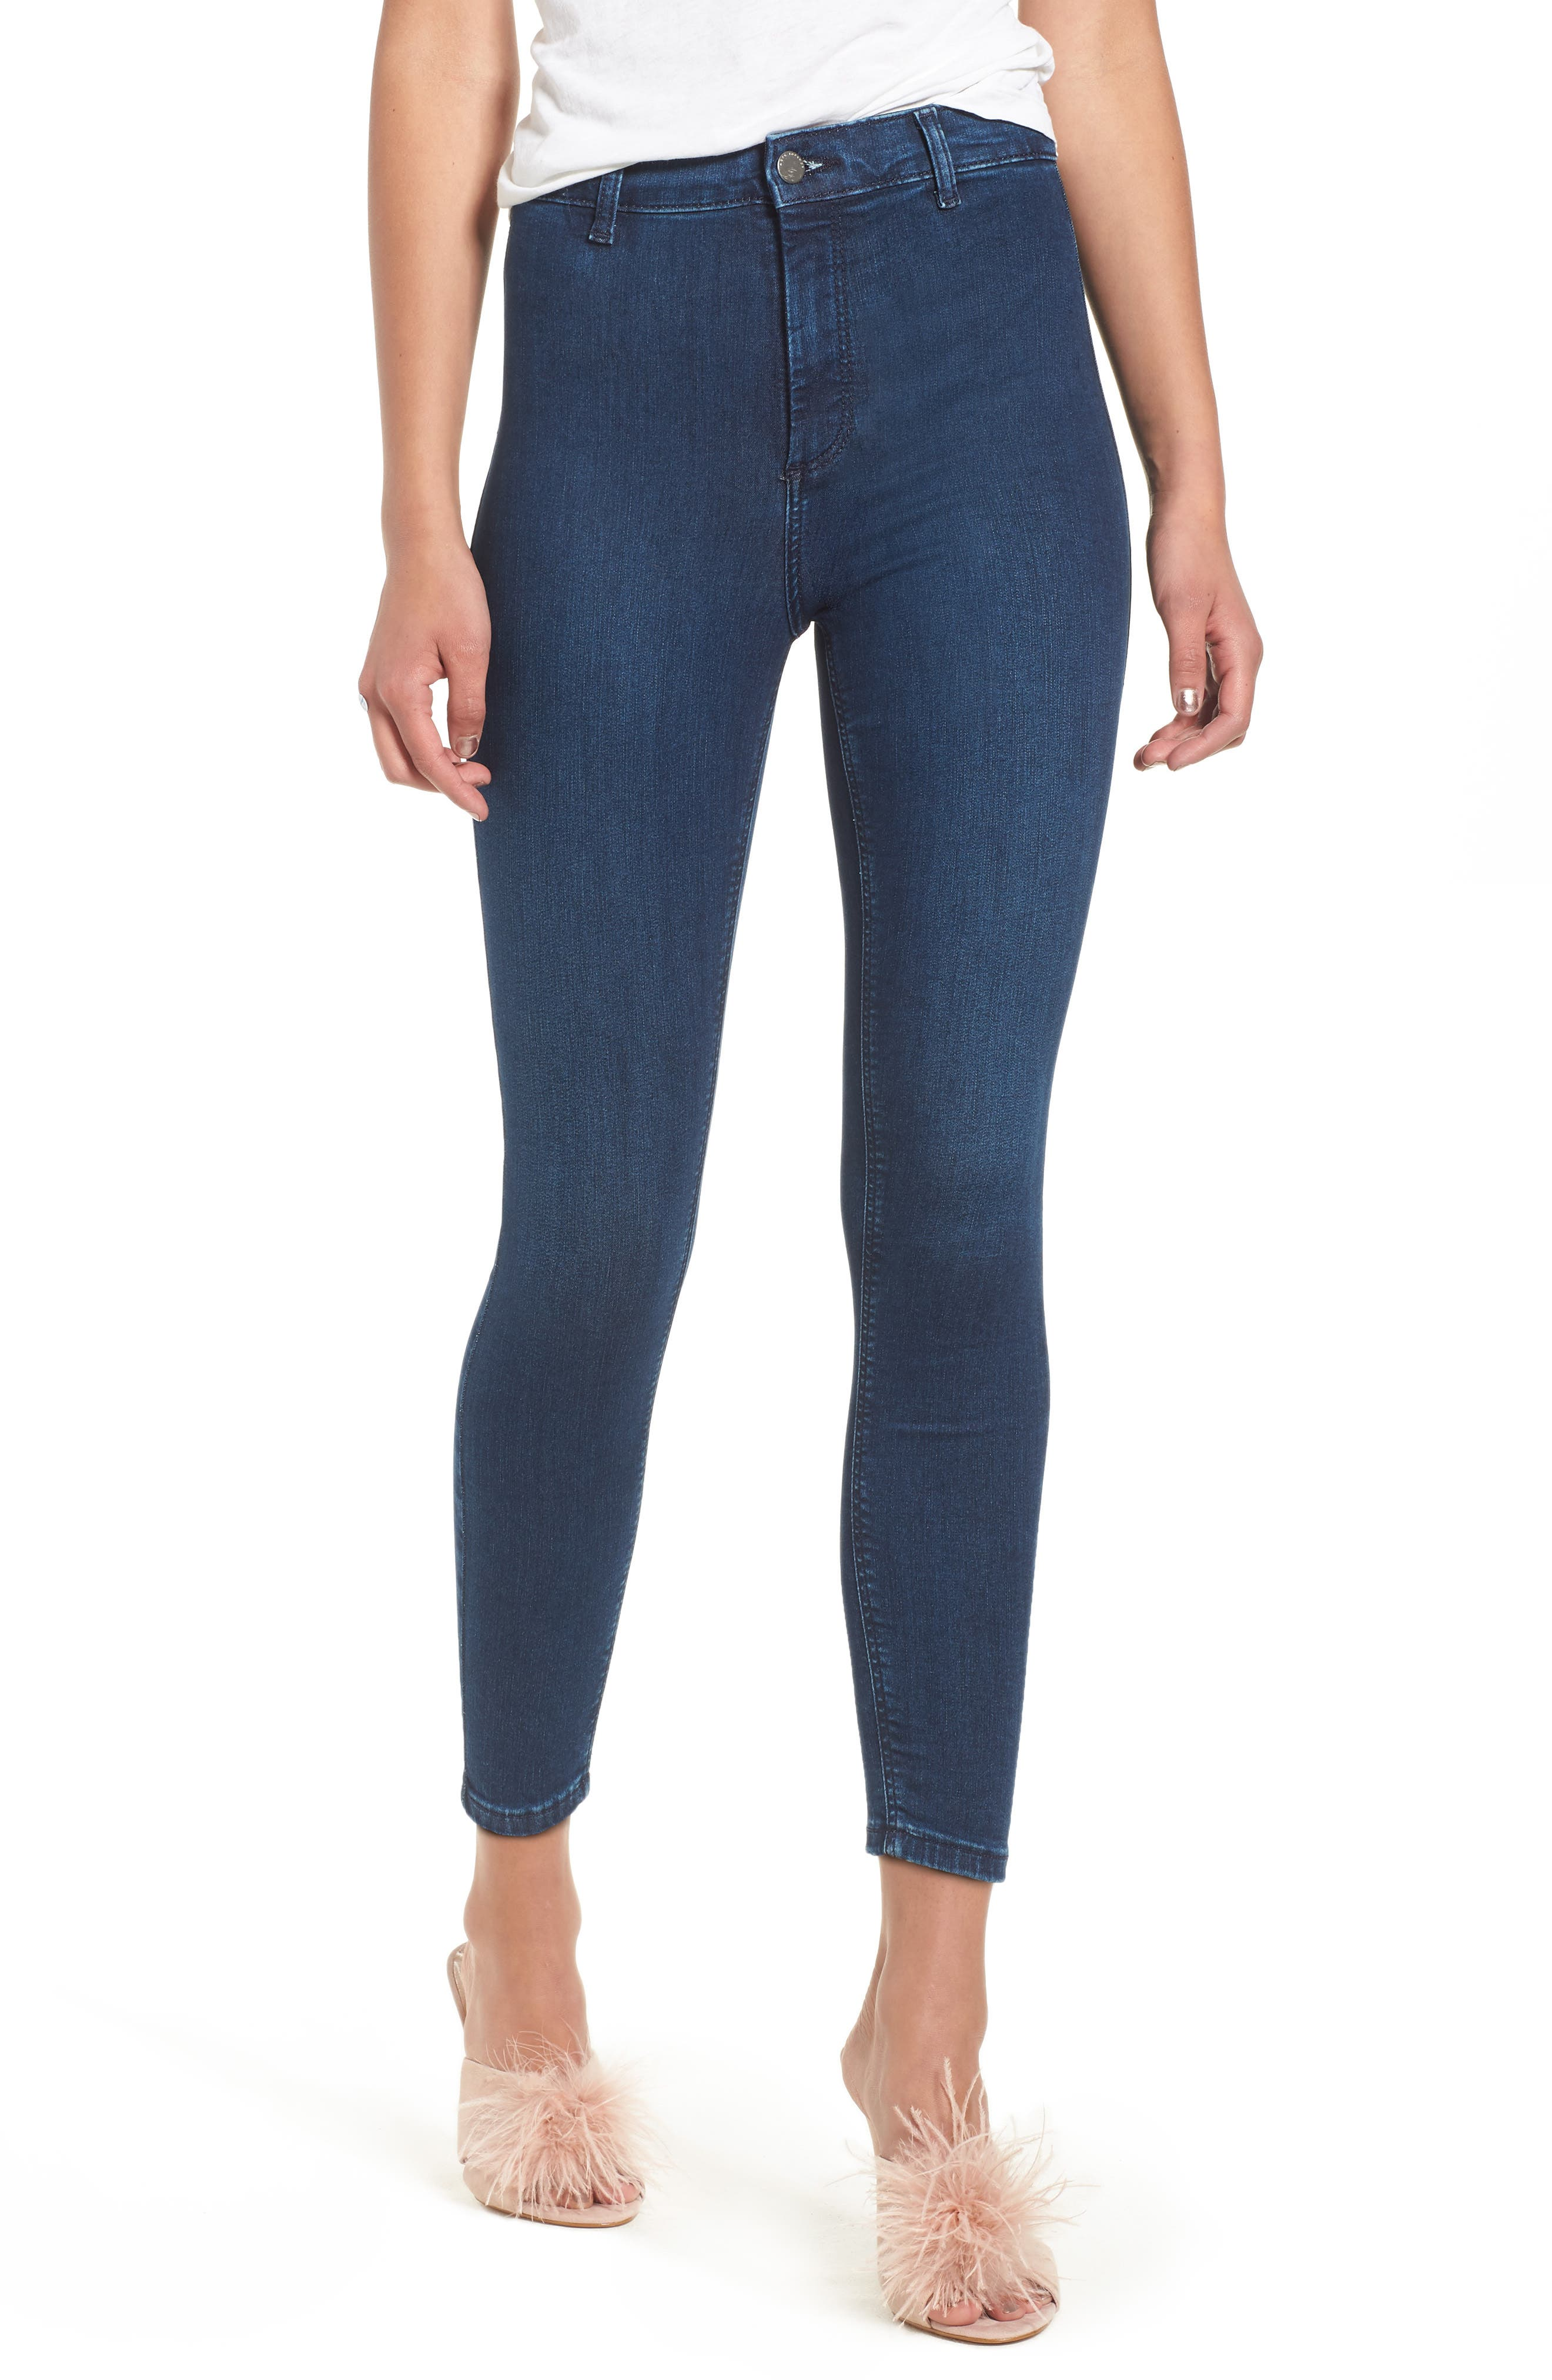 Moto Joni Indigo Jeans,                         Main,                         color,